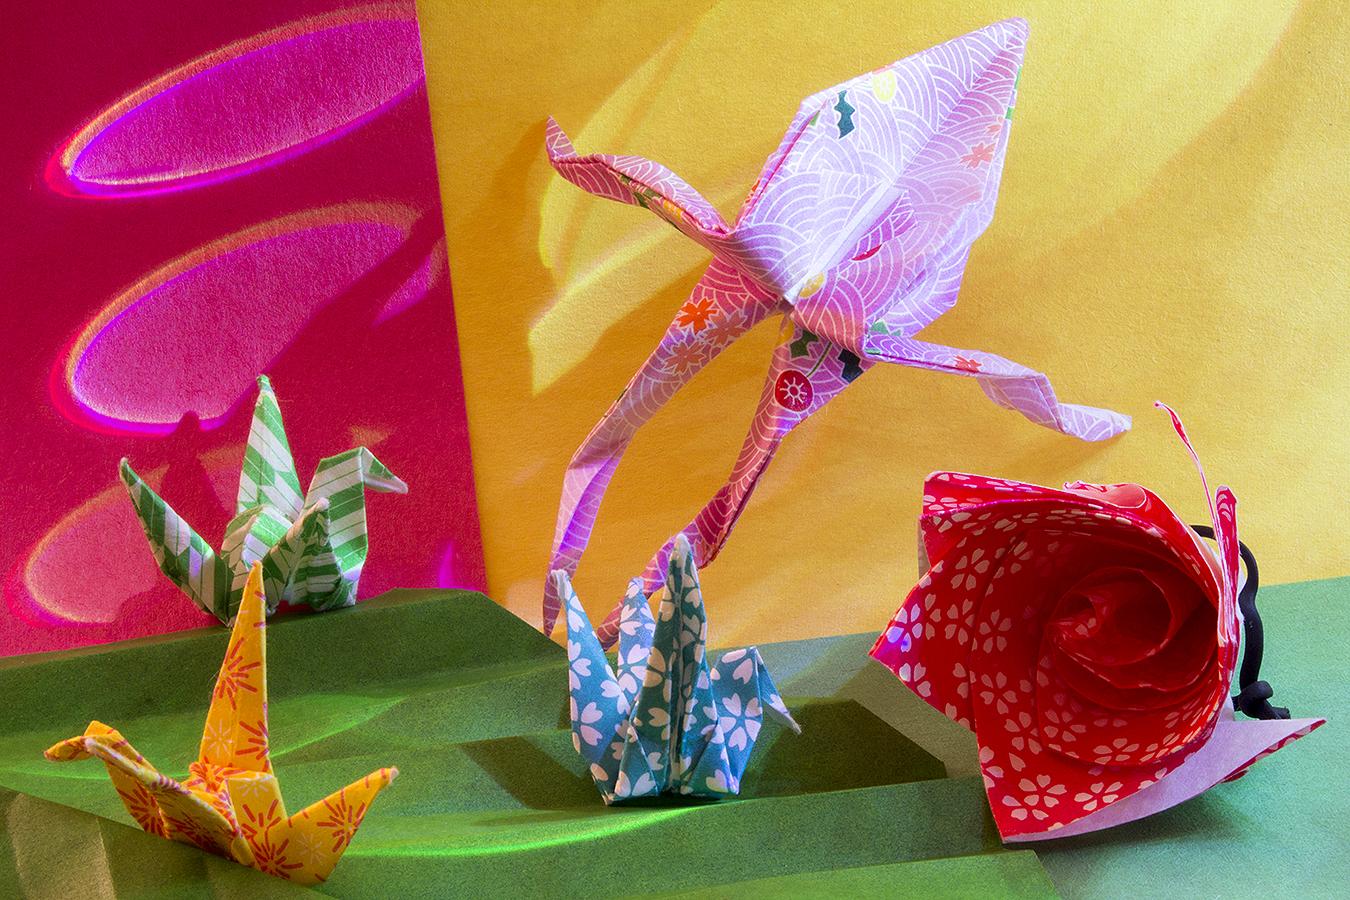 20_Colors_Jonathan_Tang_UPenn_Tony_Ward_Studio_Long_Exposure_Low_Light_LED_Optics_Origami_Paper_Frog_Crane_Rose